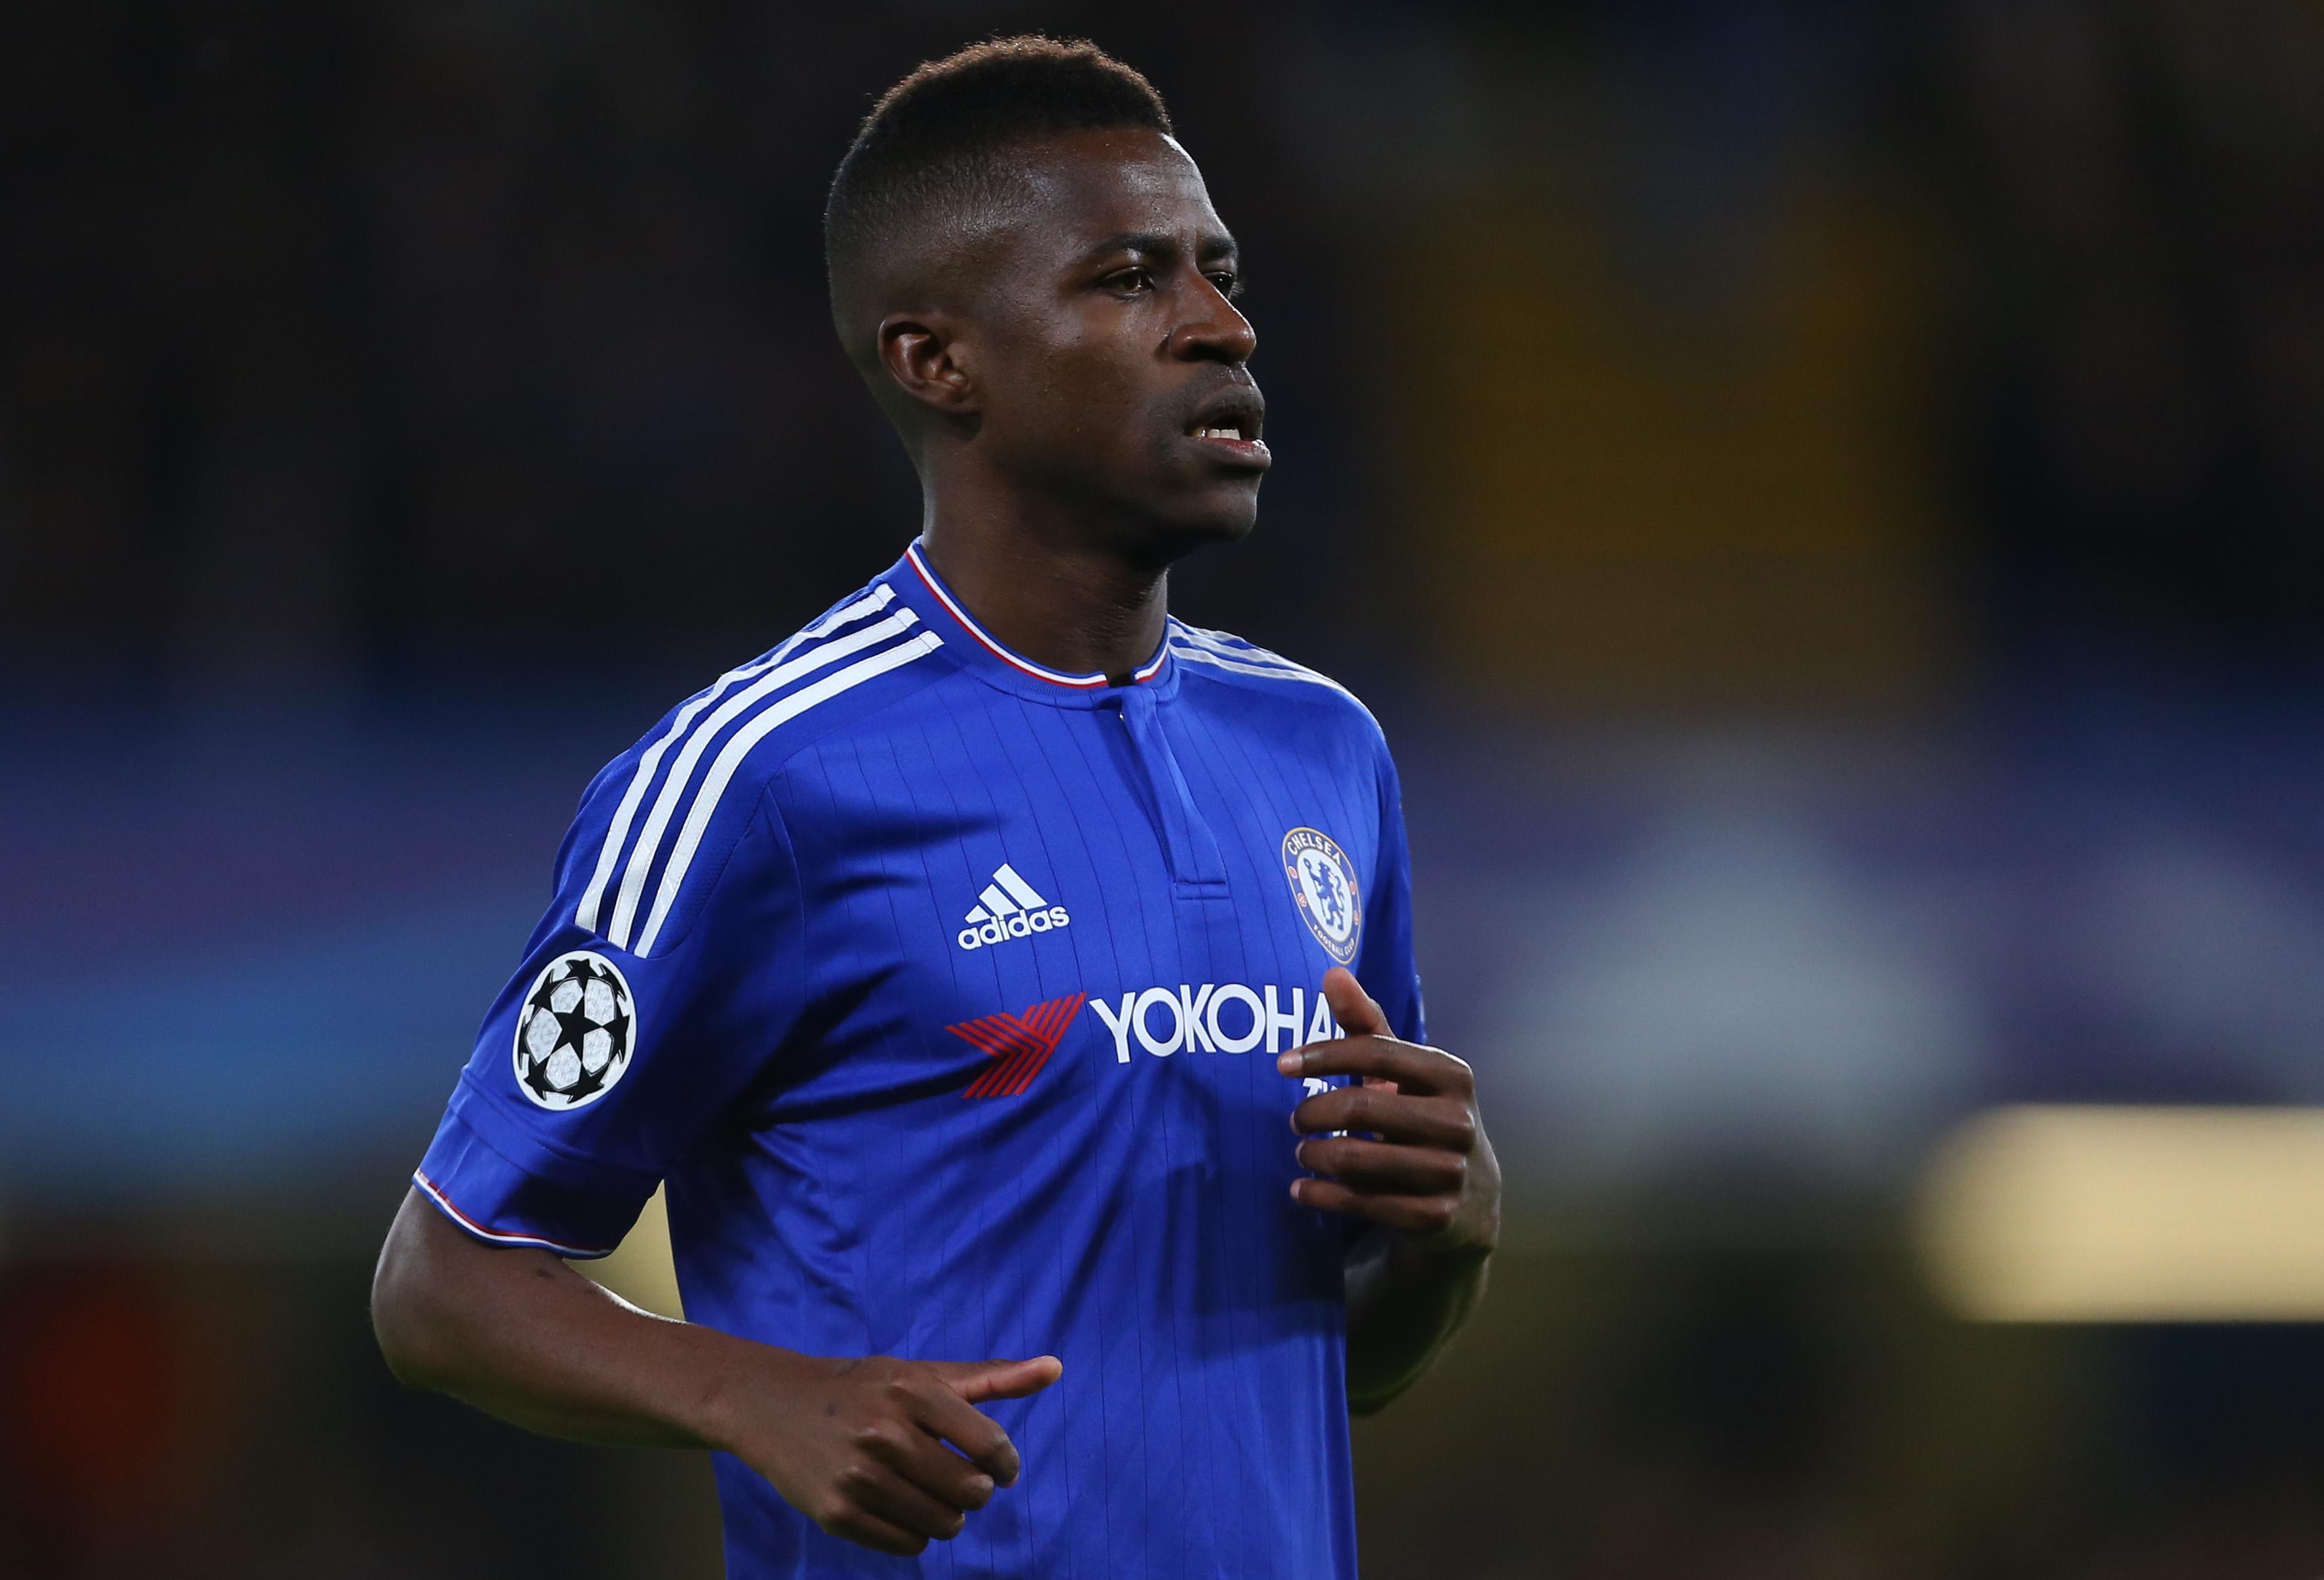 Ramires targets Chelsea transfer after Guus Hiddink arrival – report